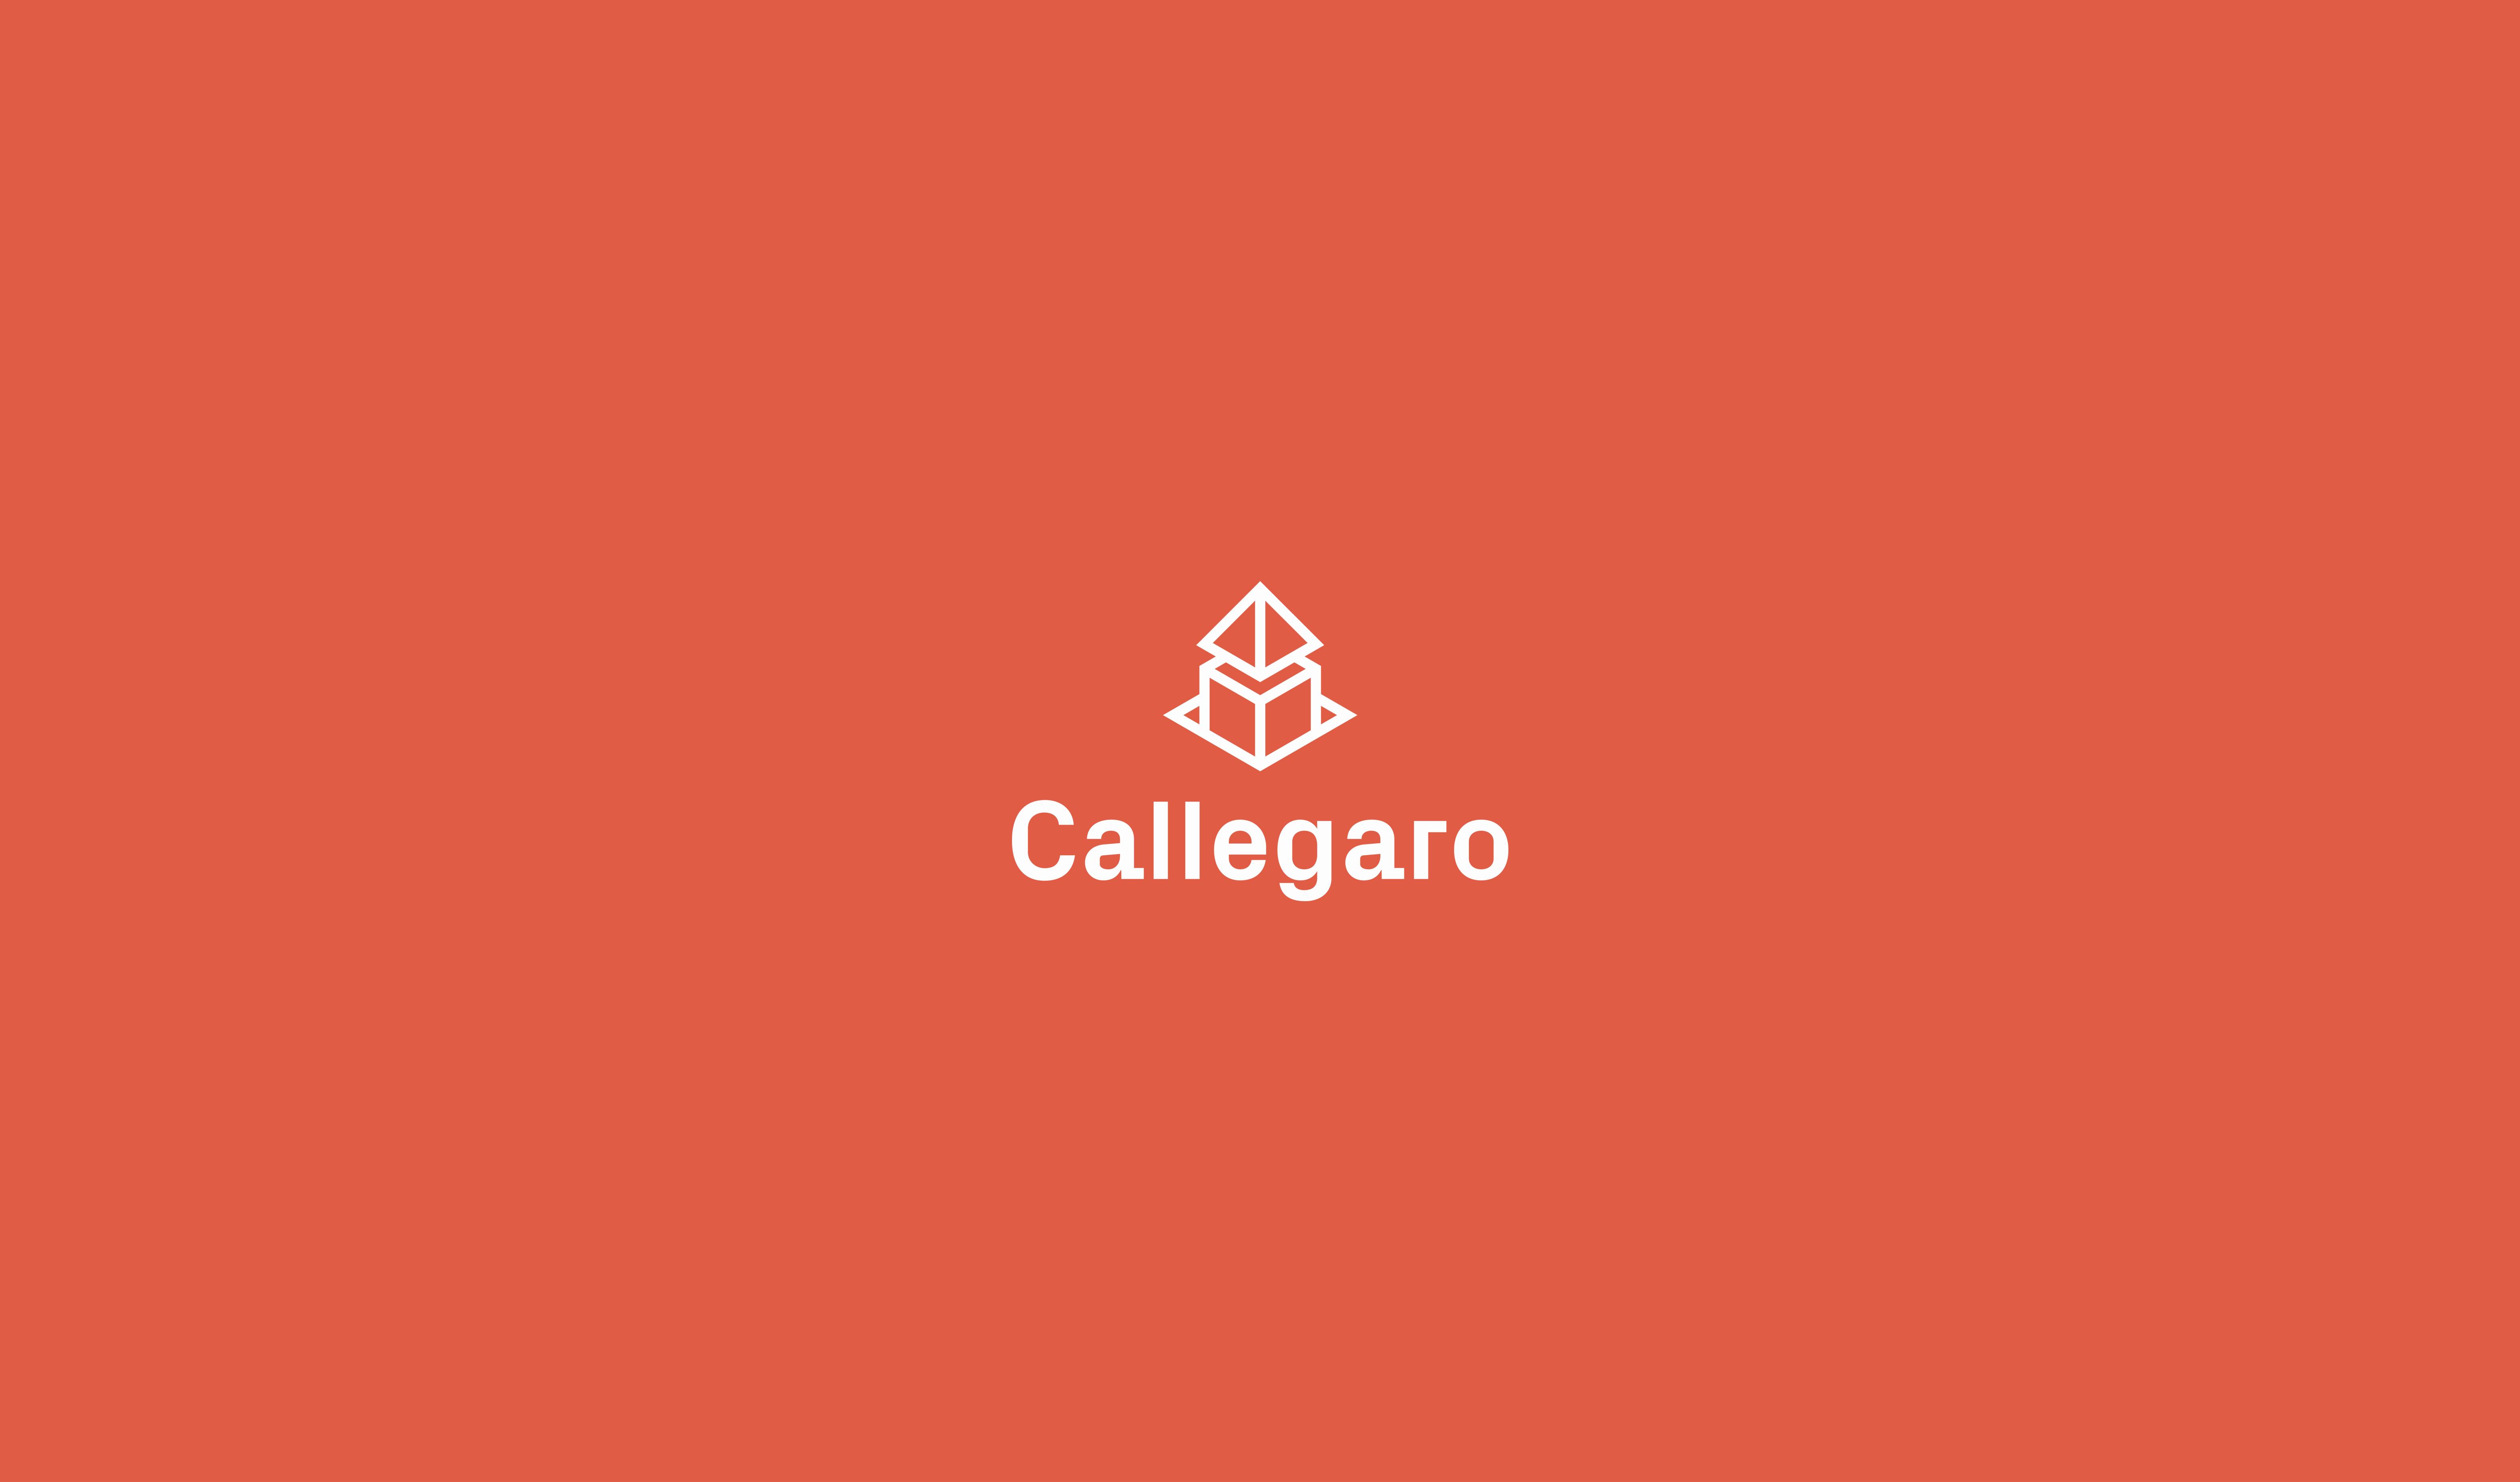 Callegaro Logotype